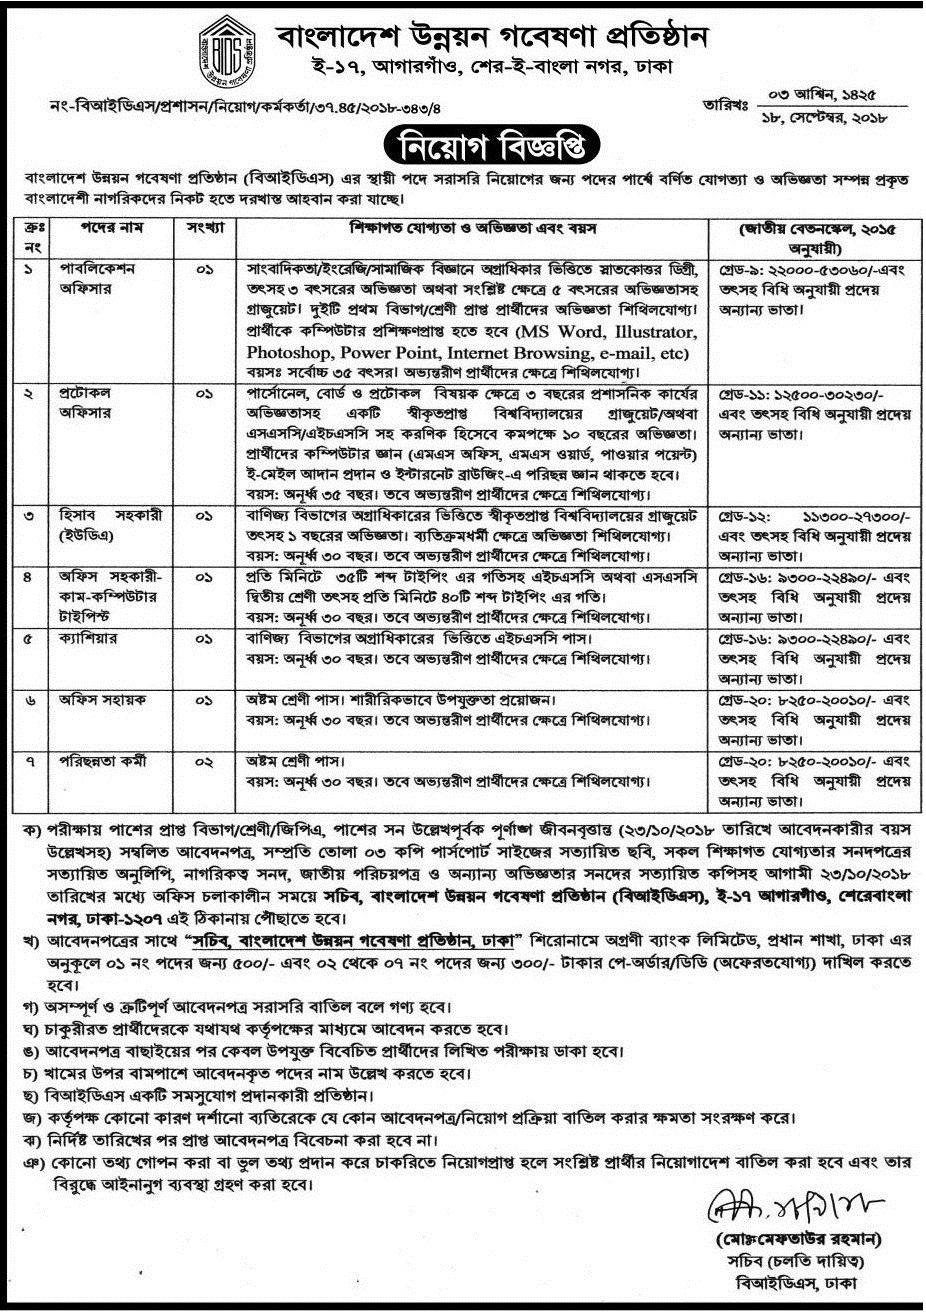 Bangladesh Institute of Development Studies BIDS Job circular 2018